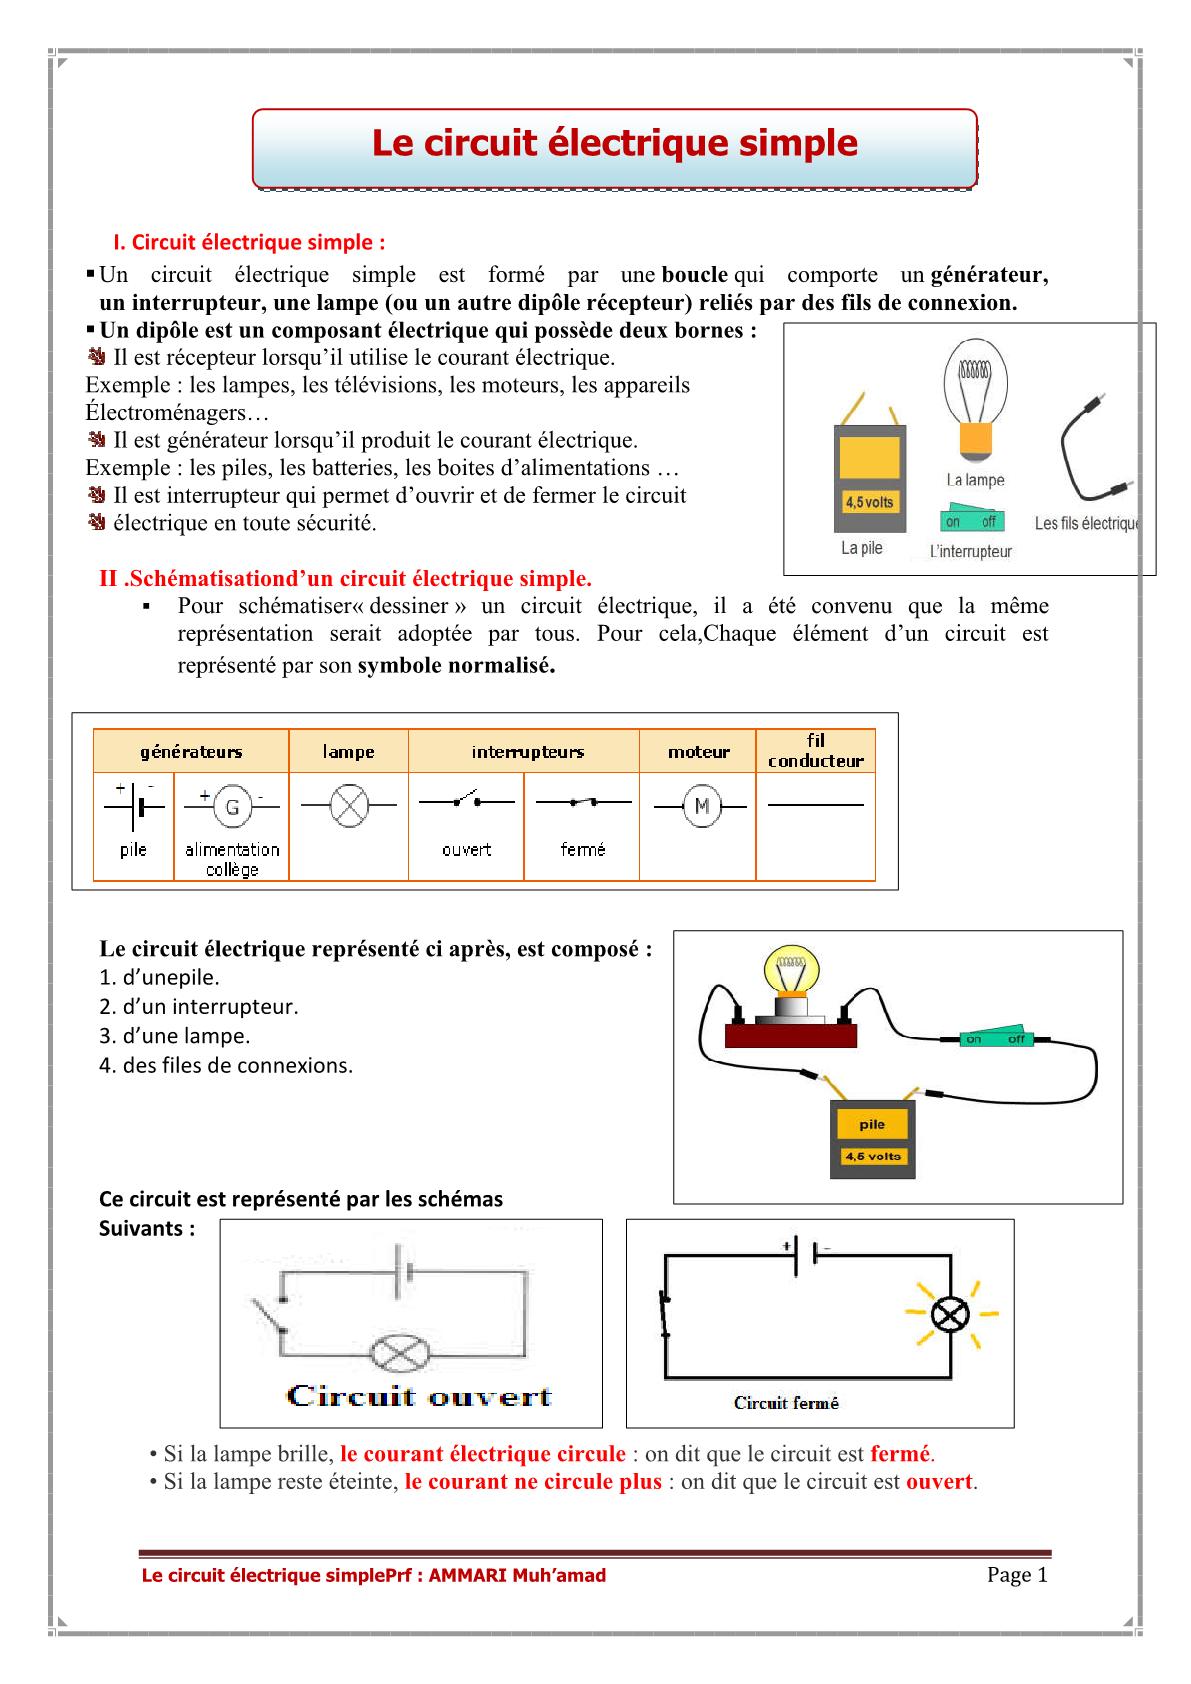 درس Le circuit électrique simple للسنة الأولى اعدادي